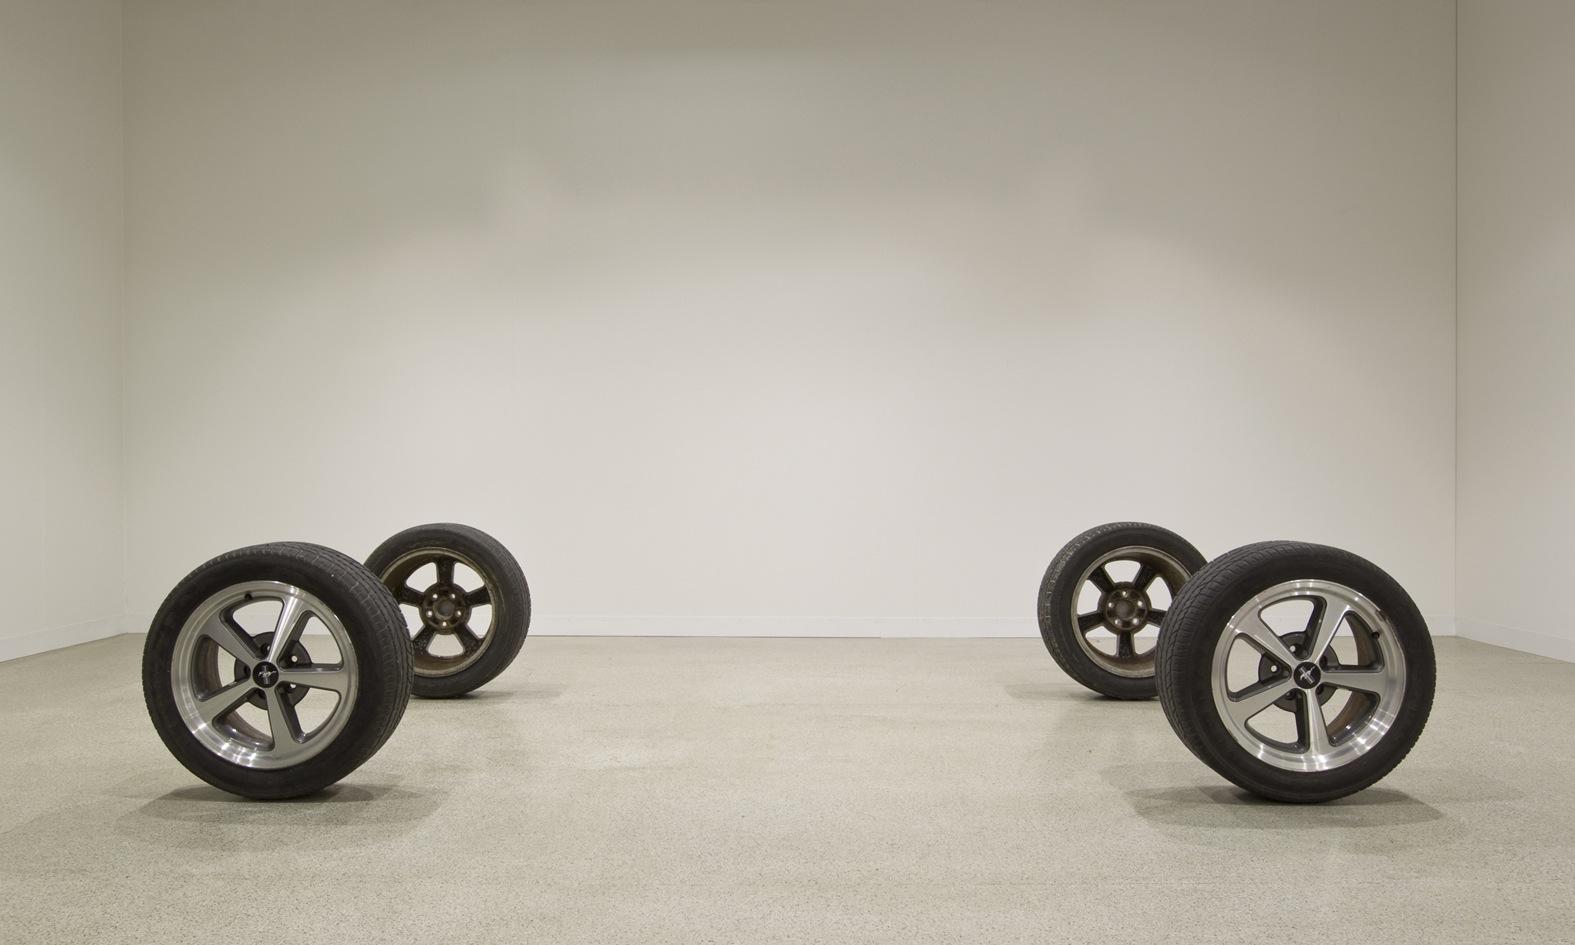 Raining Room 2012 Car wheels 63.5 x 176 x 320 cm / 25 x 69.3 x 126.3 in